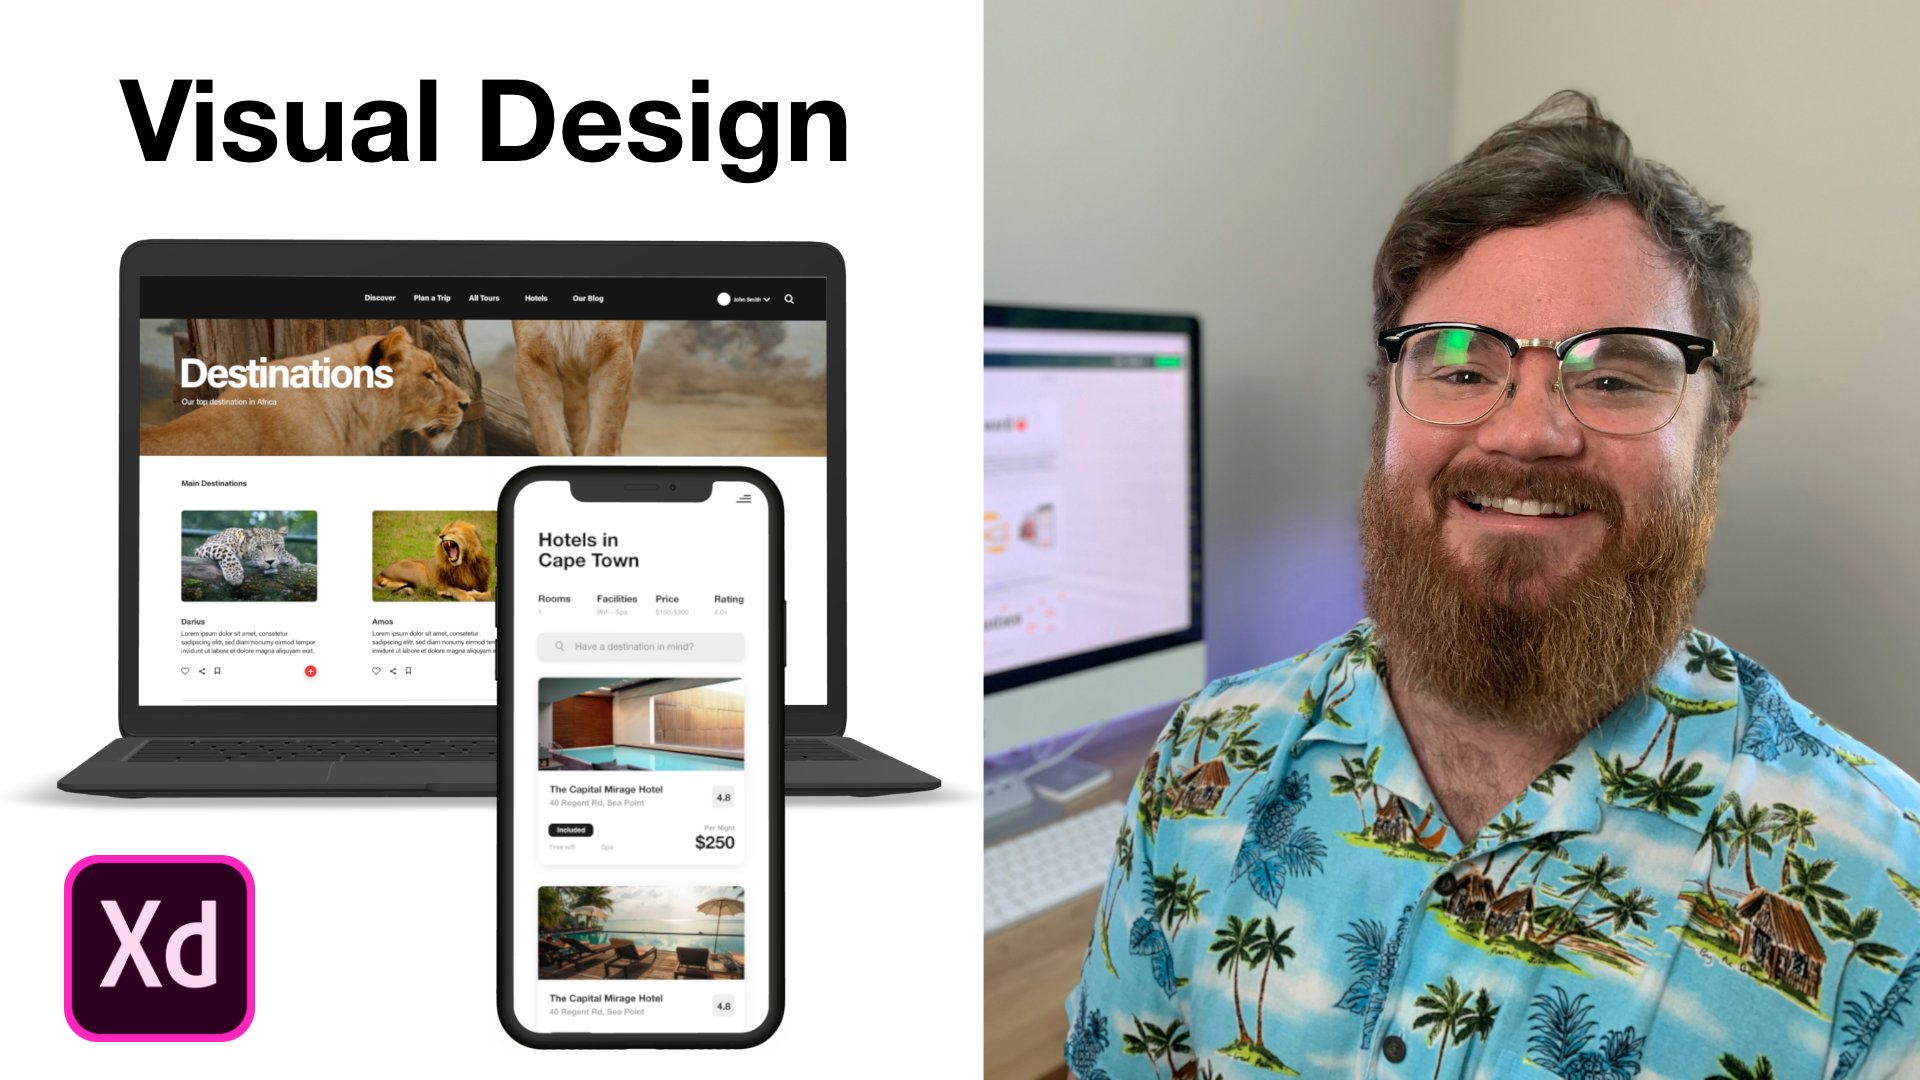 Adobe XD: Improving Visual Design